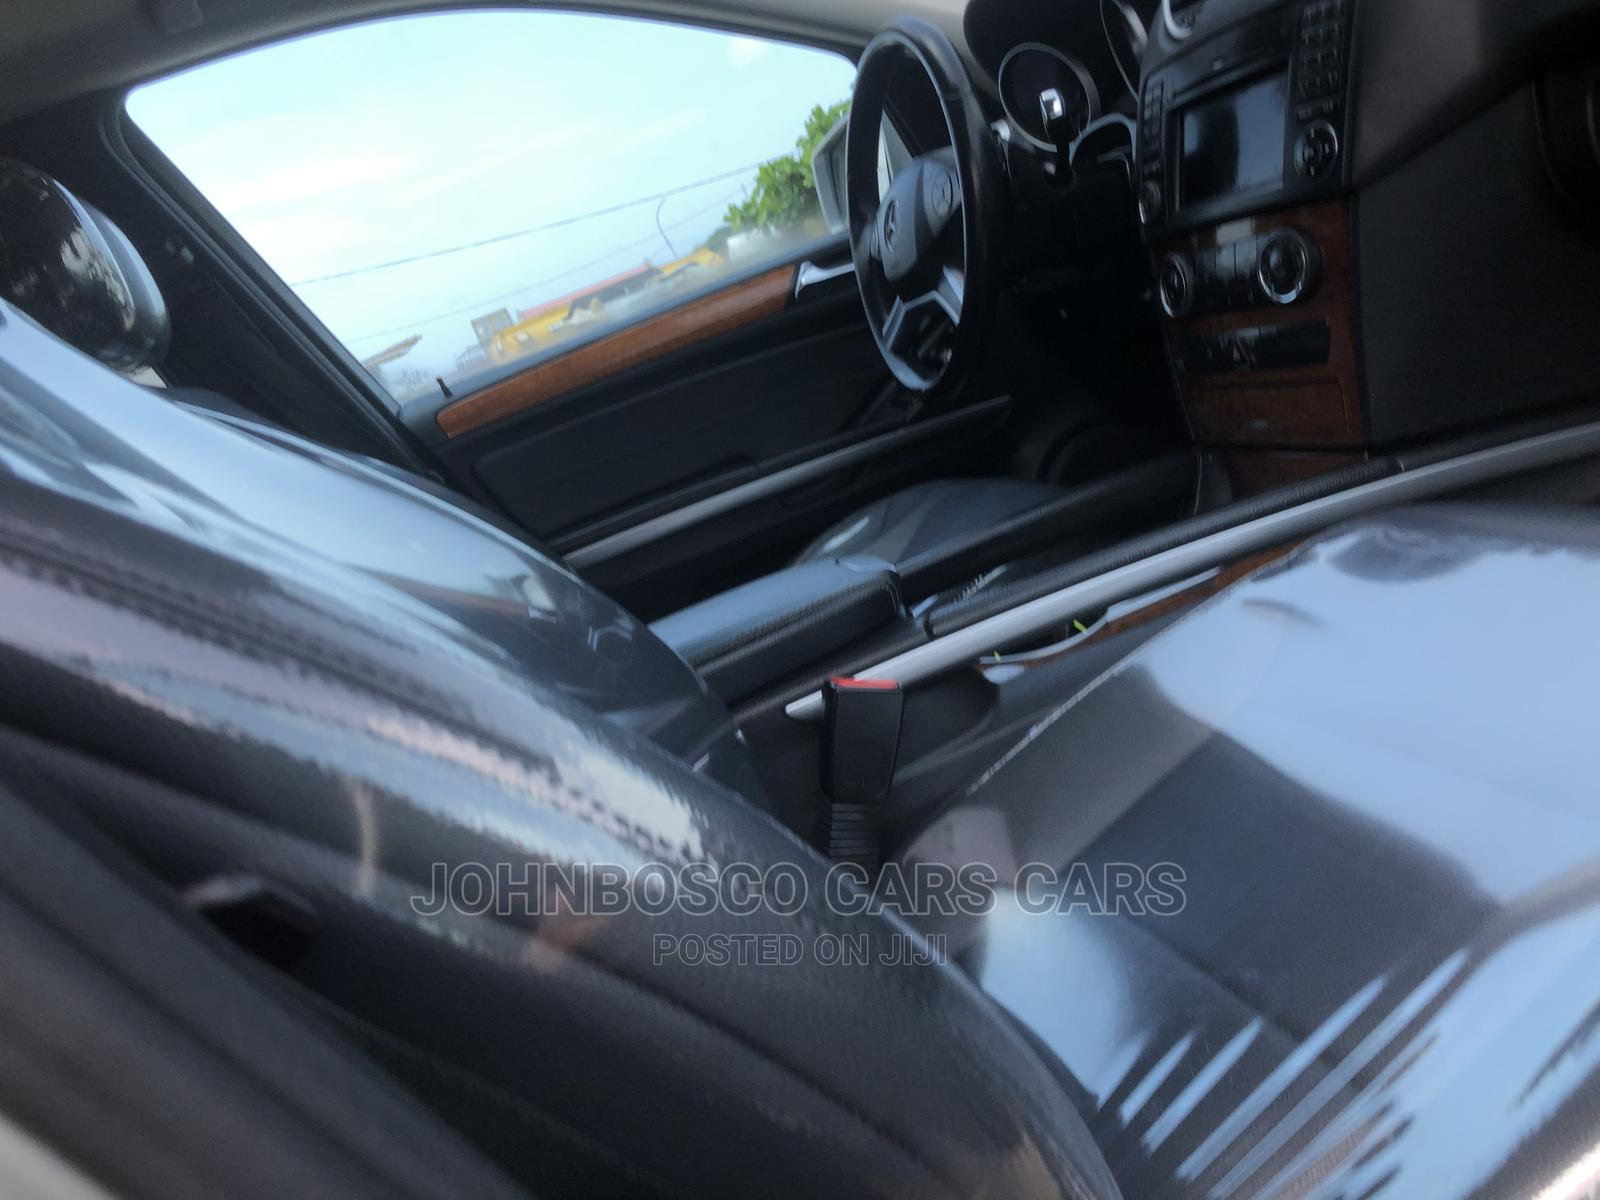 Mercedes-Benz M Class 2010 ML 350 4Matic | Cars for sale in Apapa, Lagos State, Nigeria